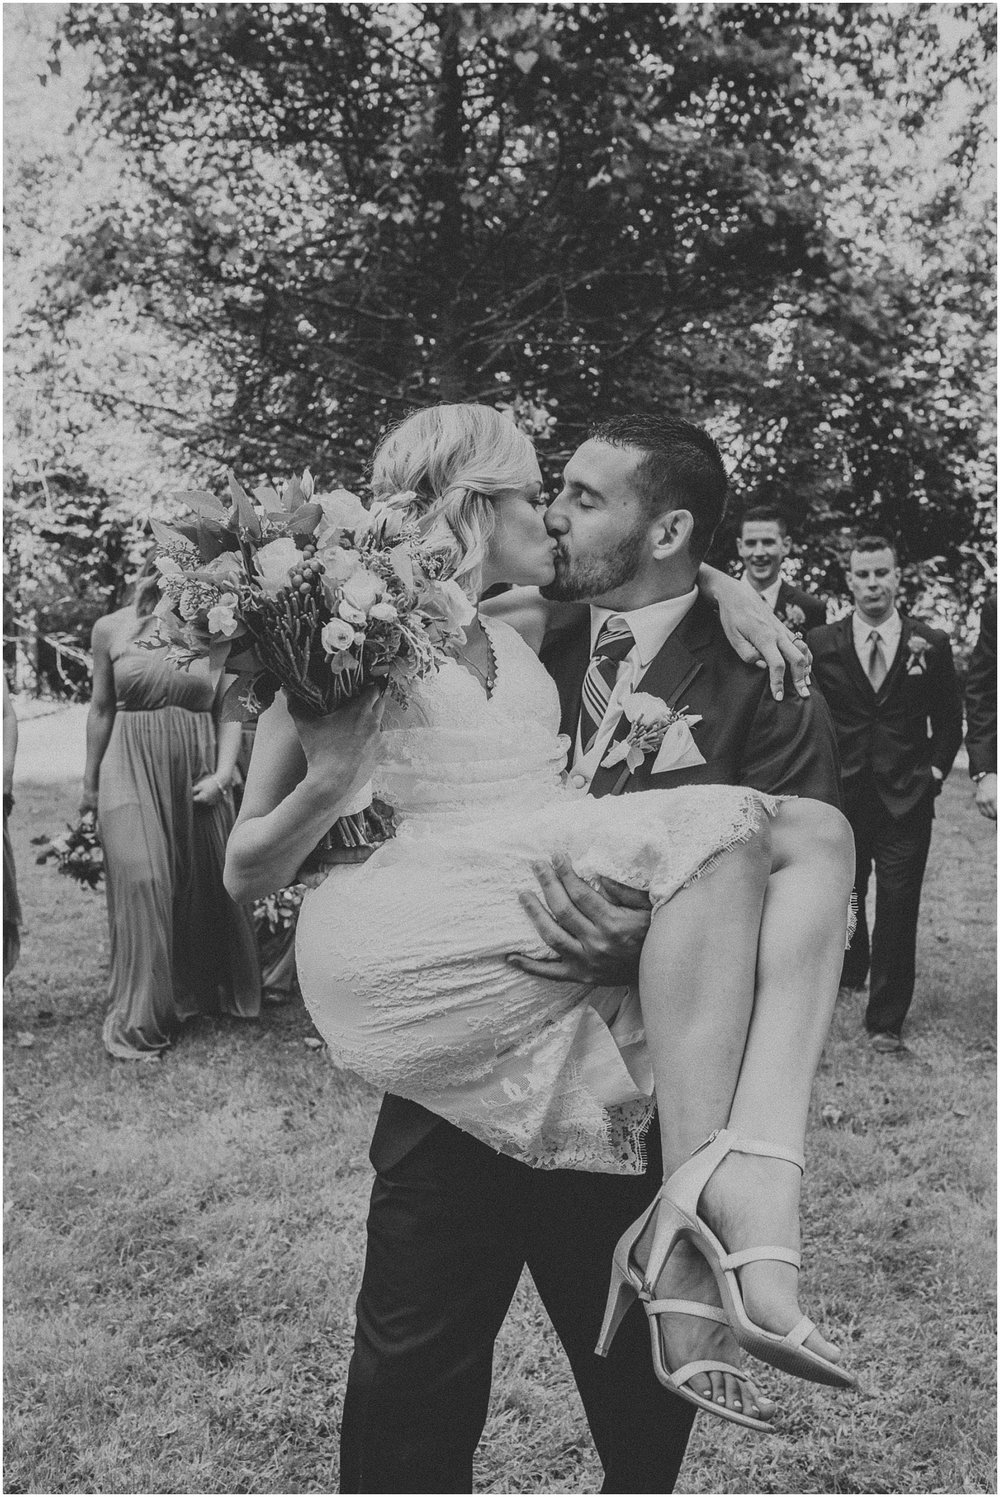 waterloo-village-waterloo village-wedding-outdoor wedding-rustic-boemian-new jersey-bride-groom-wedding party-davids bridal-wedding dress-wedding-first kiss-intimate wedding_0379.jpg